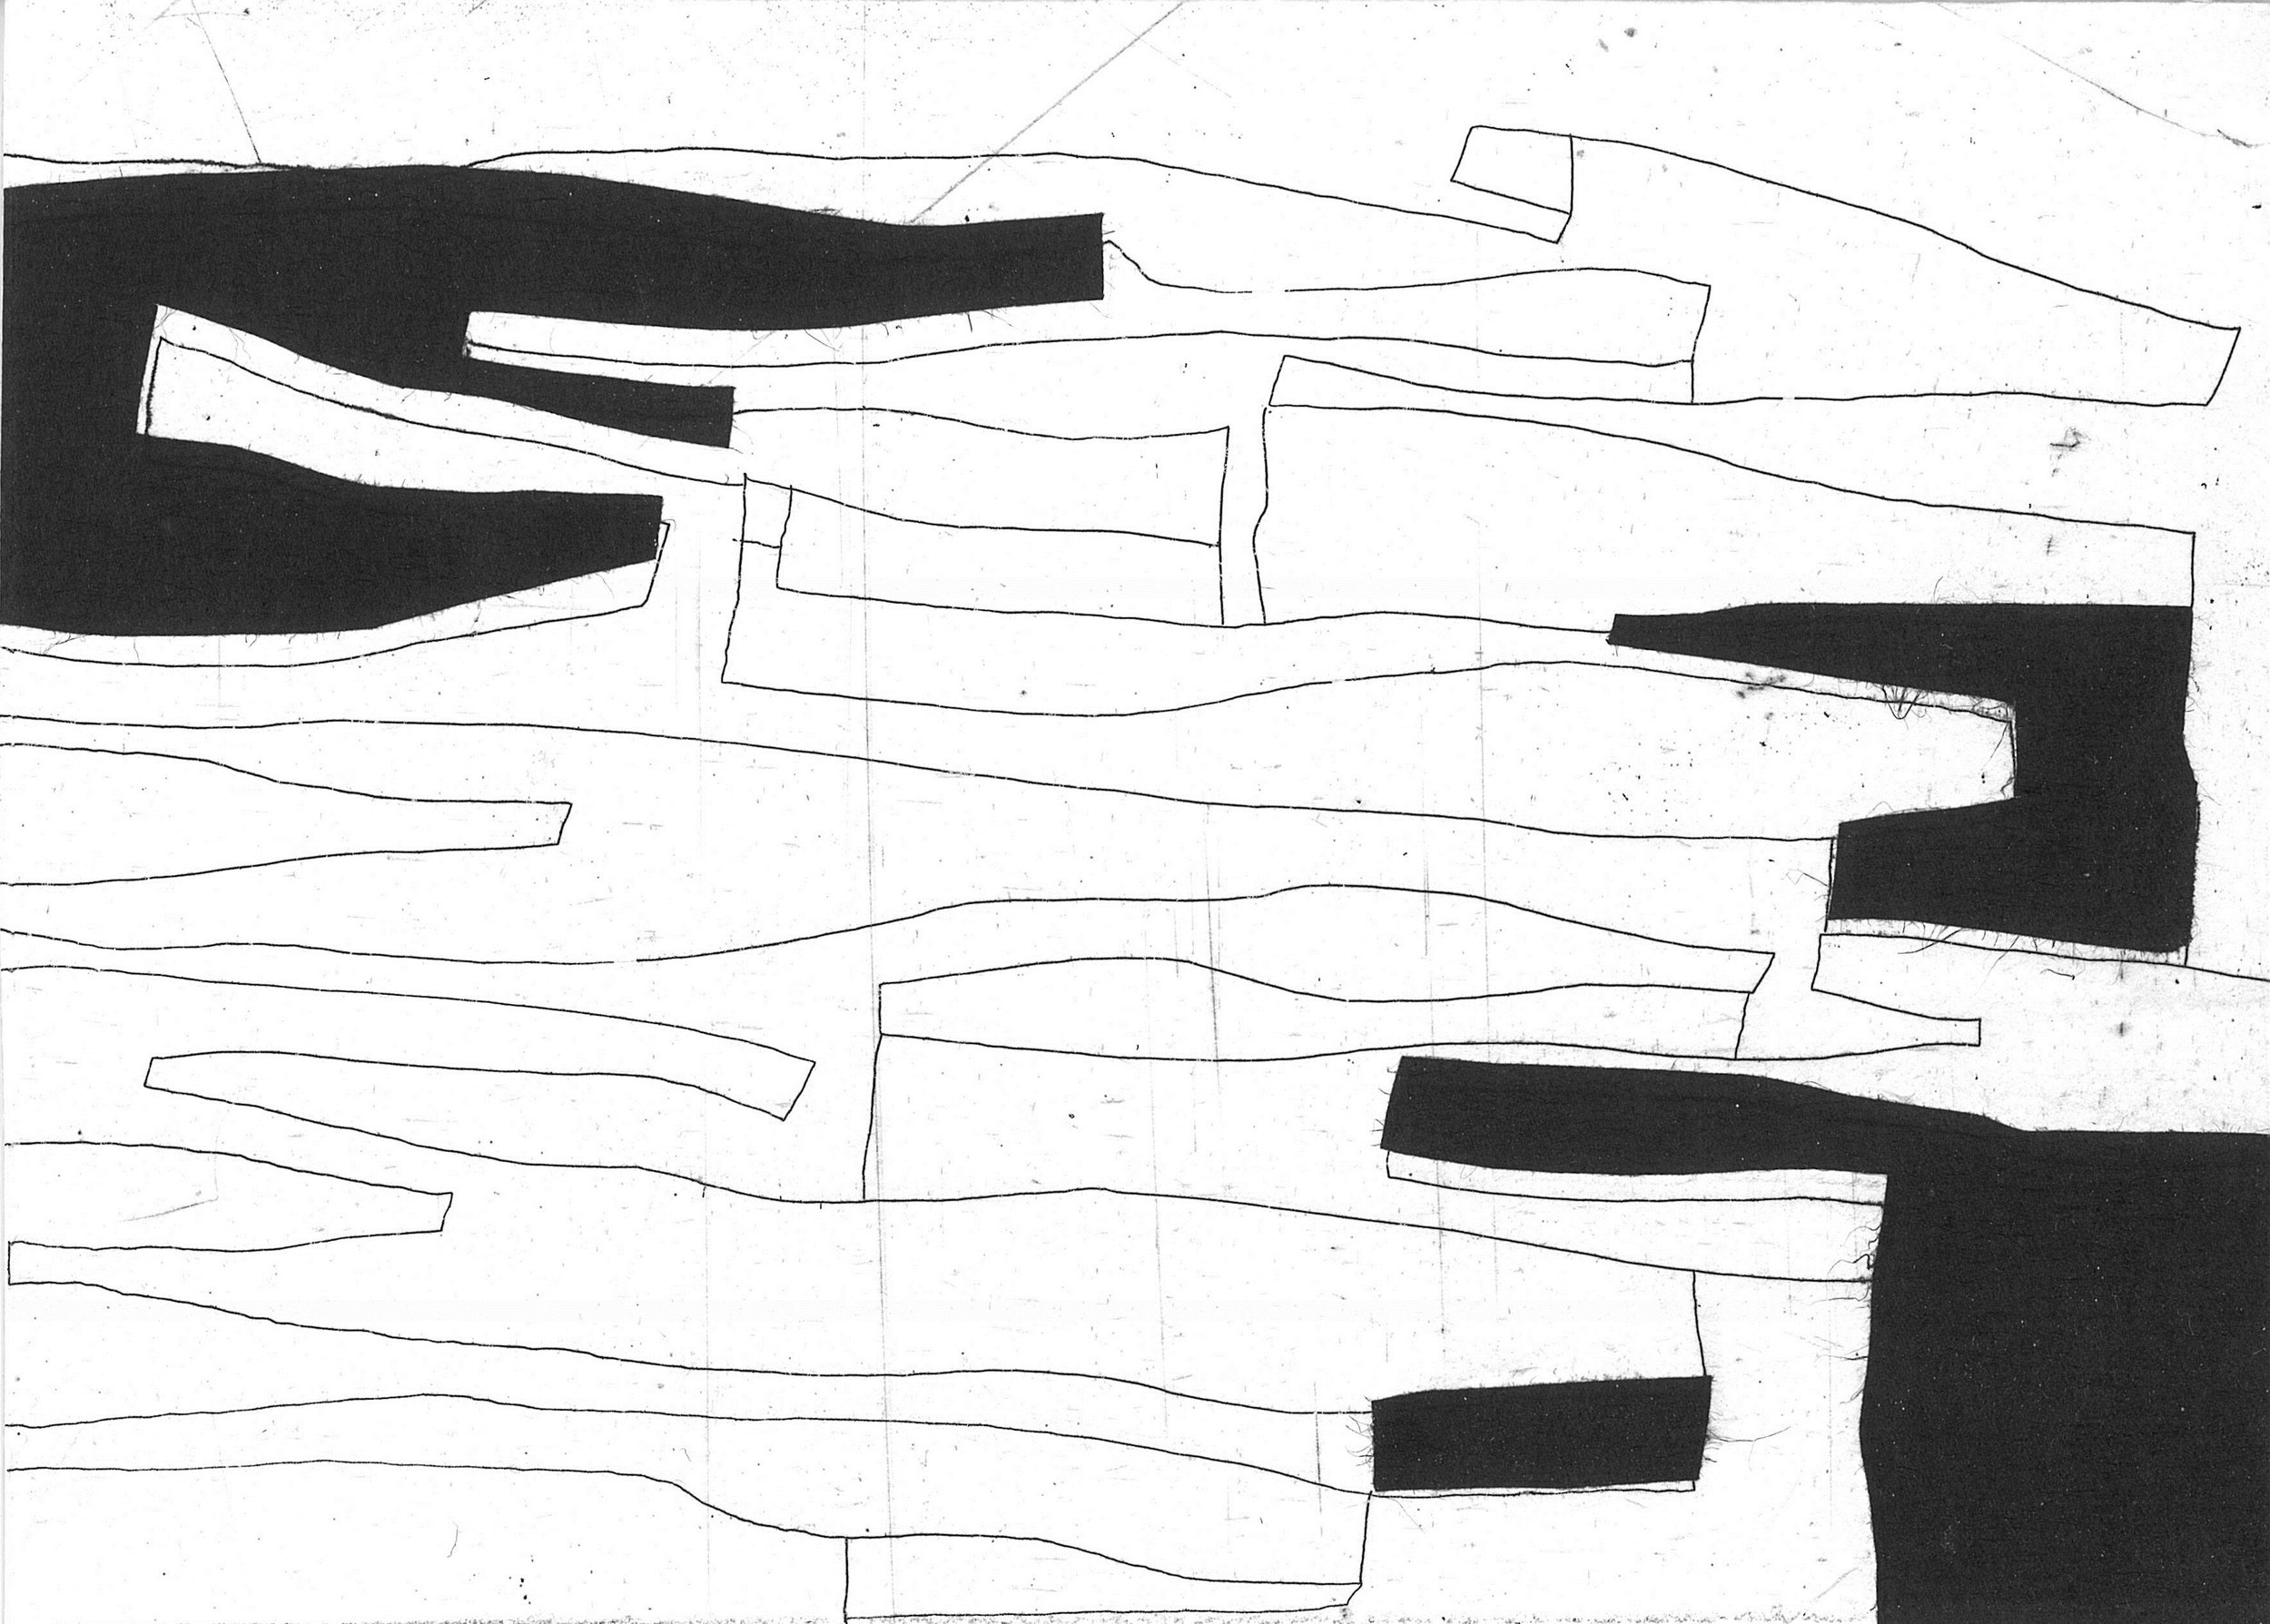 Tooney Philips - Untitled #1.jpg